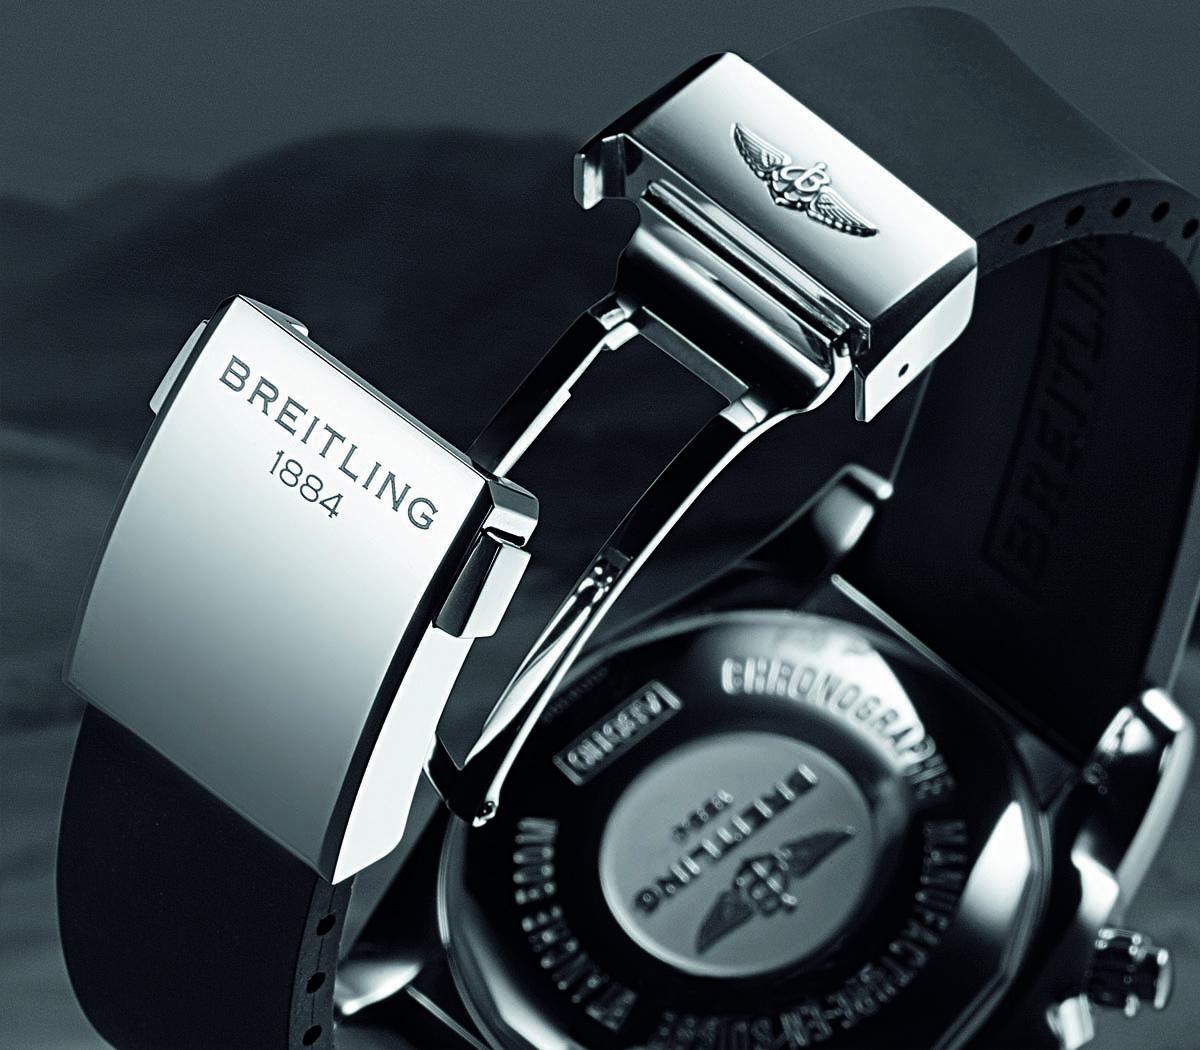 Comparative Review - Breitling Chronomat B01 vs. IWC Ingenieur Chronograph - 4